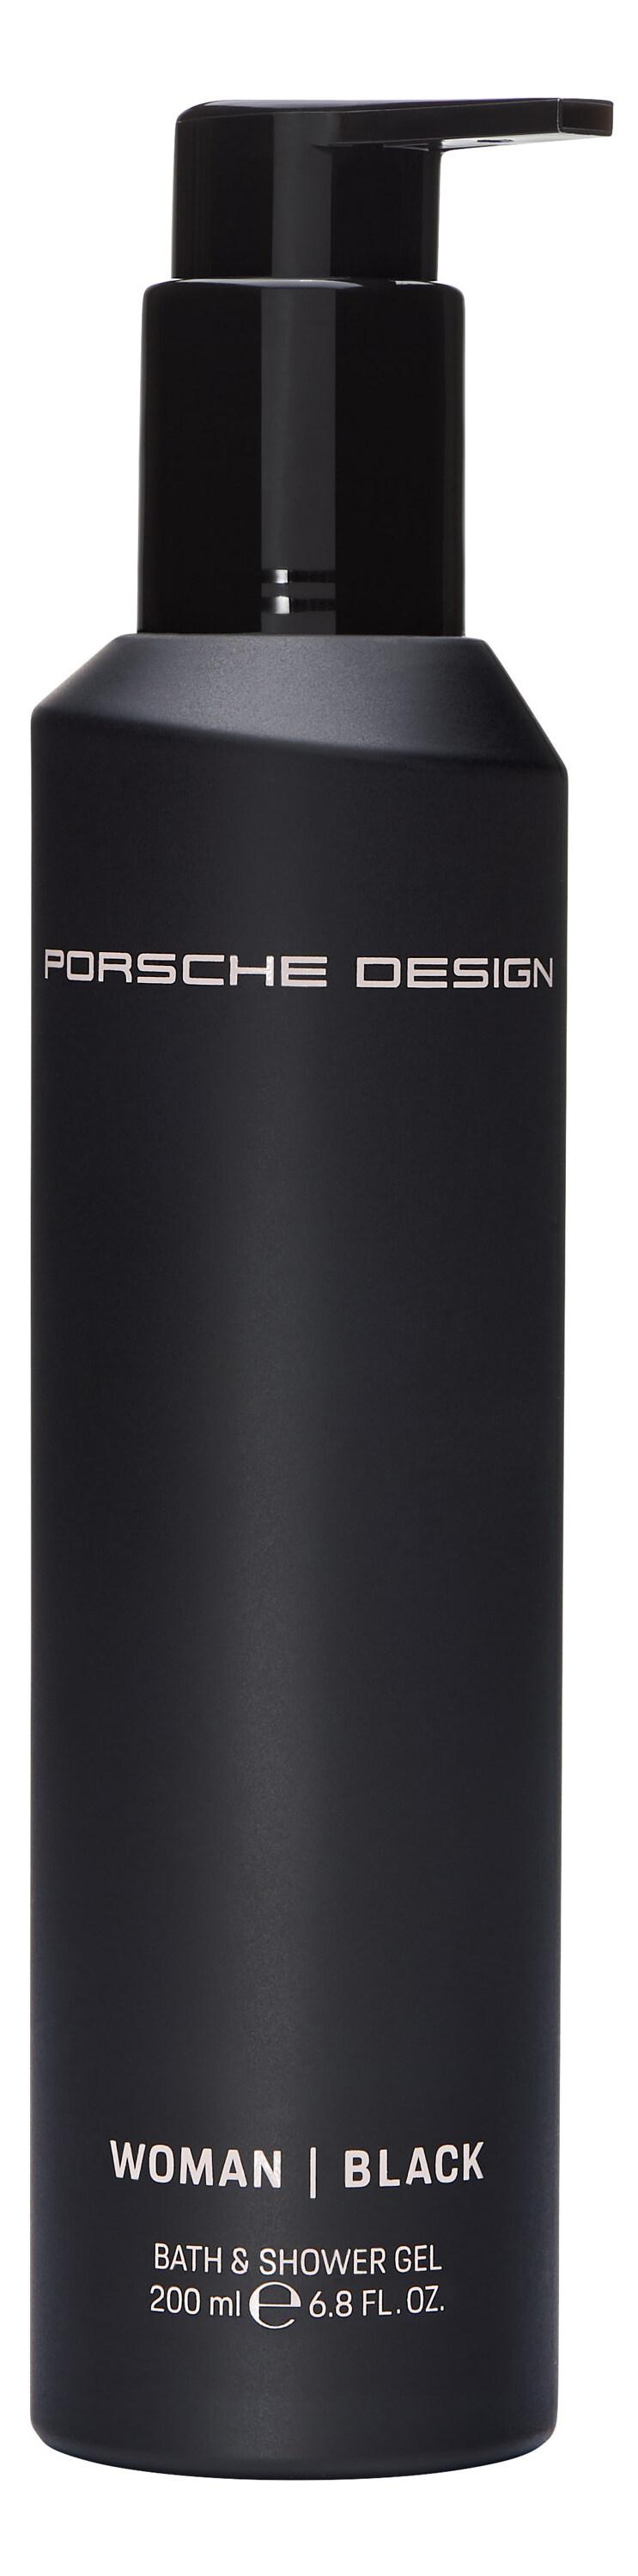 Porsche Design Woman Black by Porsche Design (2019